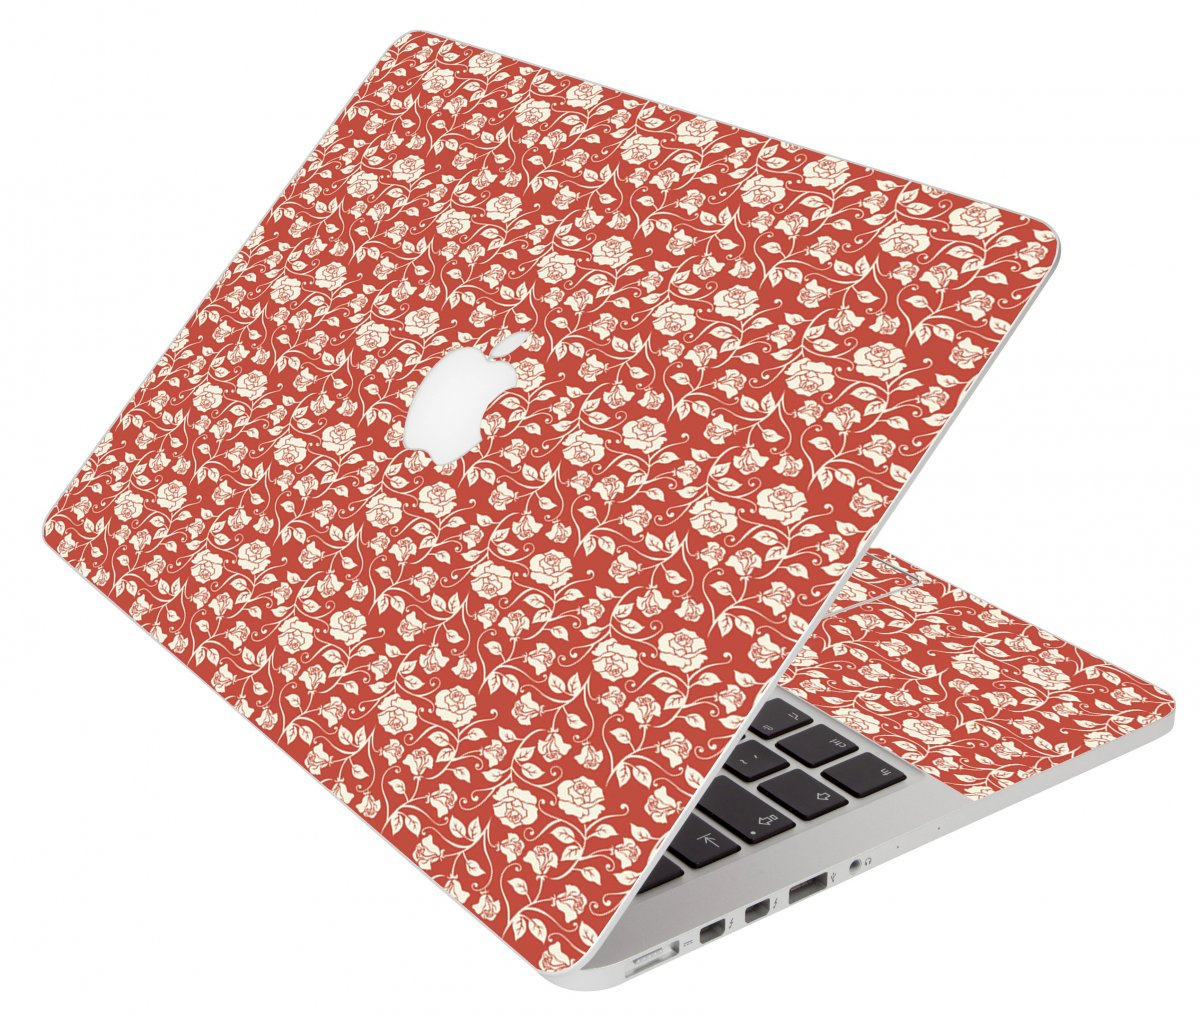 Pink Roses Apple Macbook Pro 17 A1297 Laptop Skin